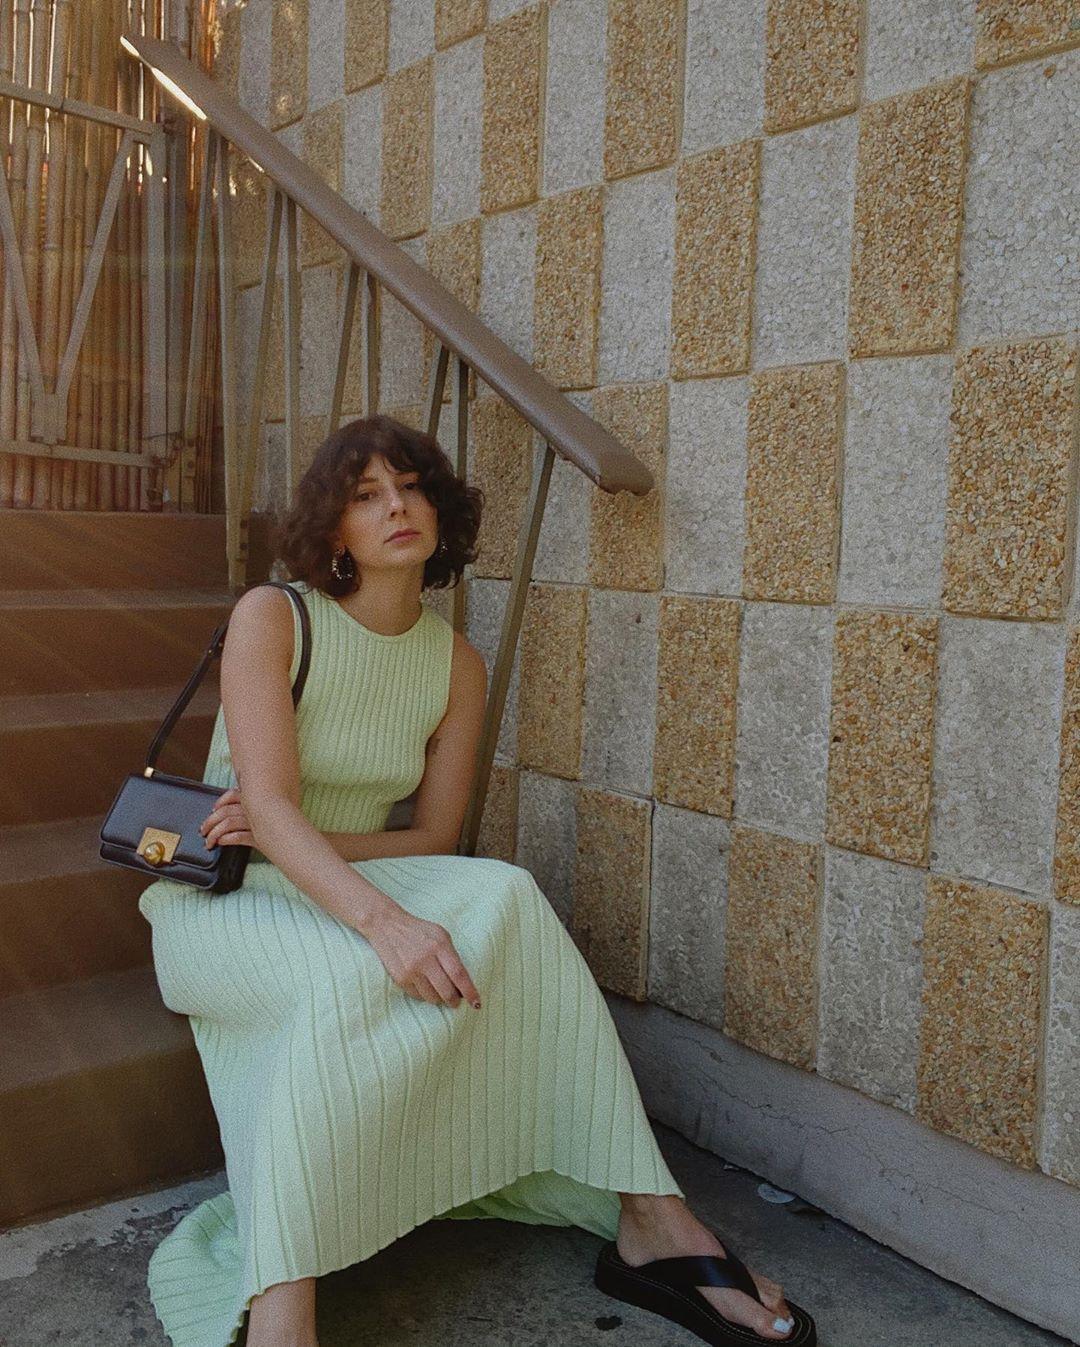 Alyssa Coscarelli's Ribbed Dress Look Is Perfect